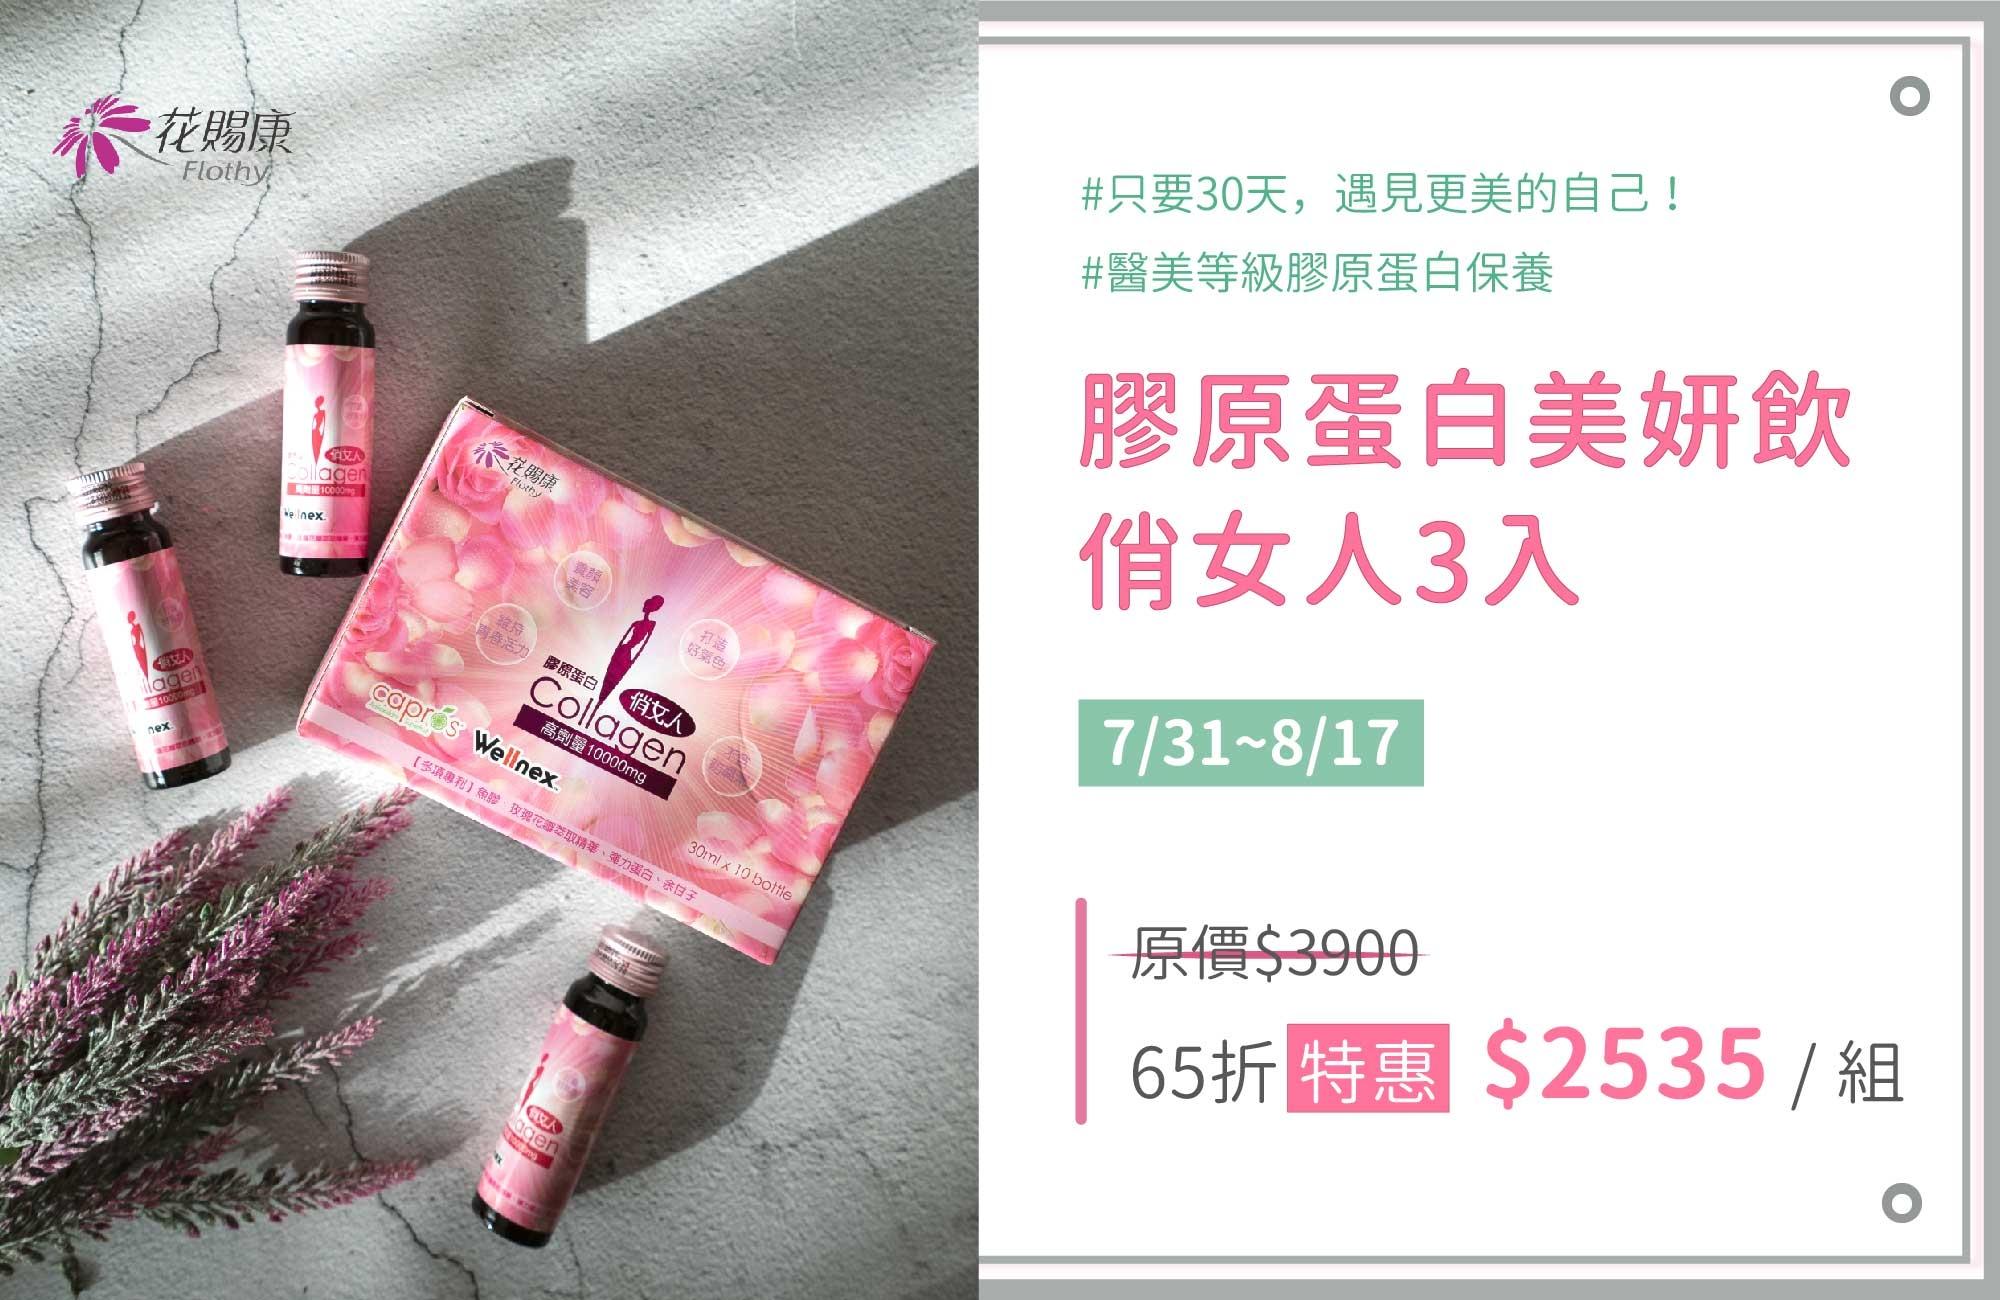 flothy-promotion-collagen-x3